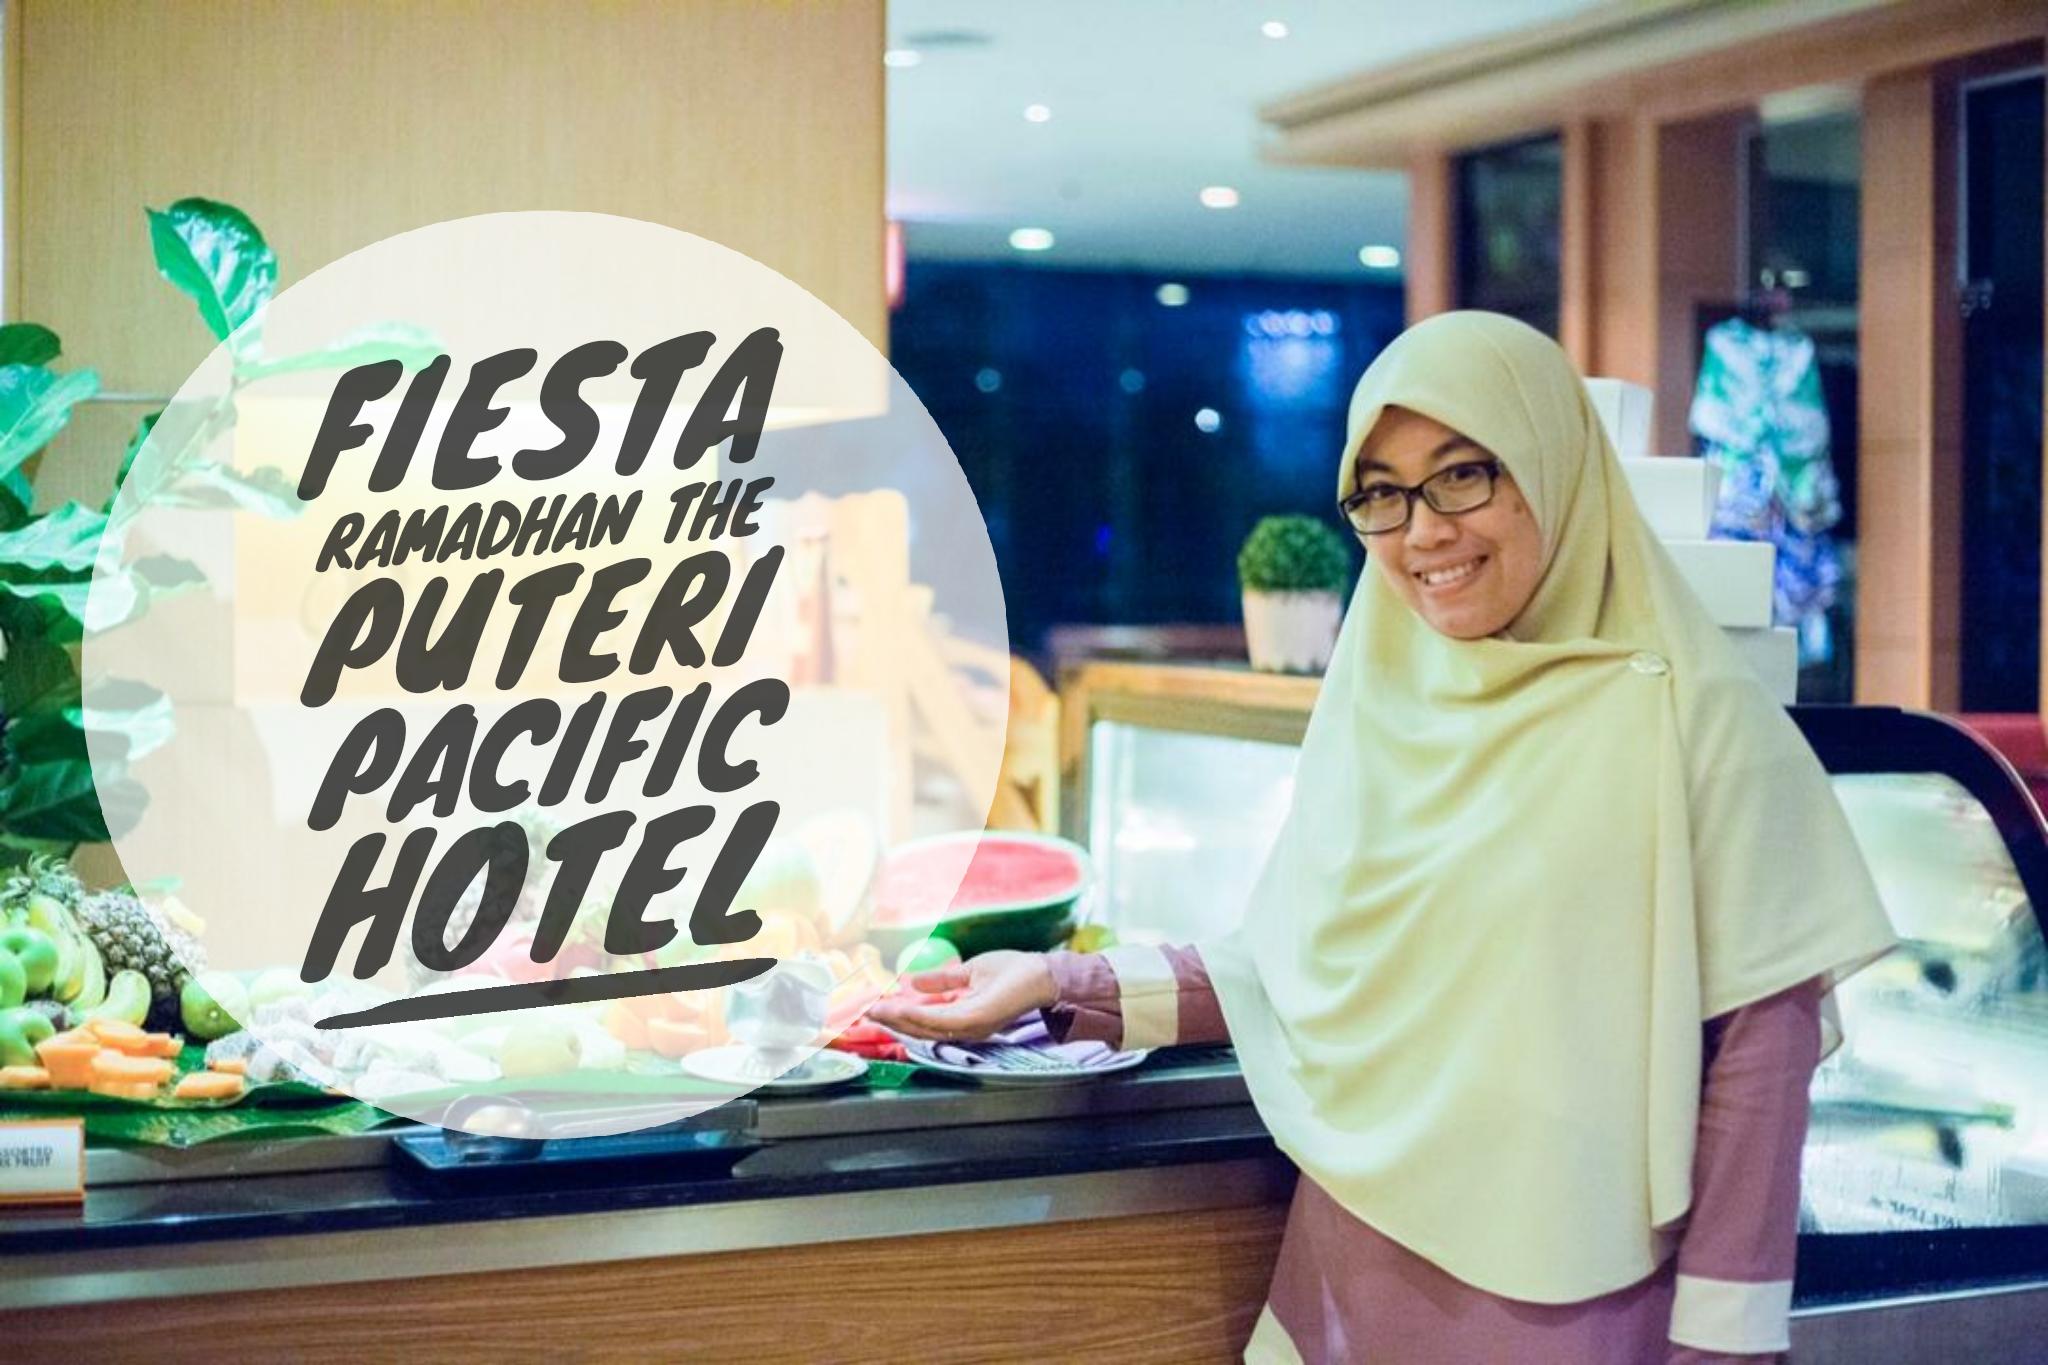 Ramadhan Buffet 2018 | Fiesta Ramadhan The Puteri Pacific Hotel Johor Bahru